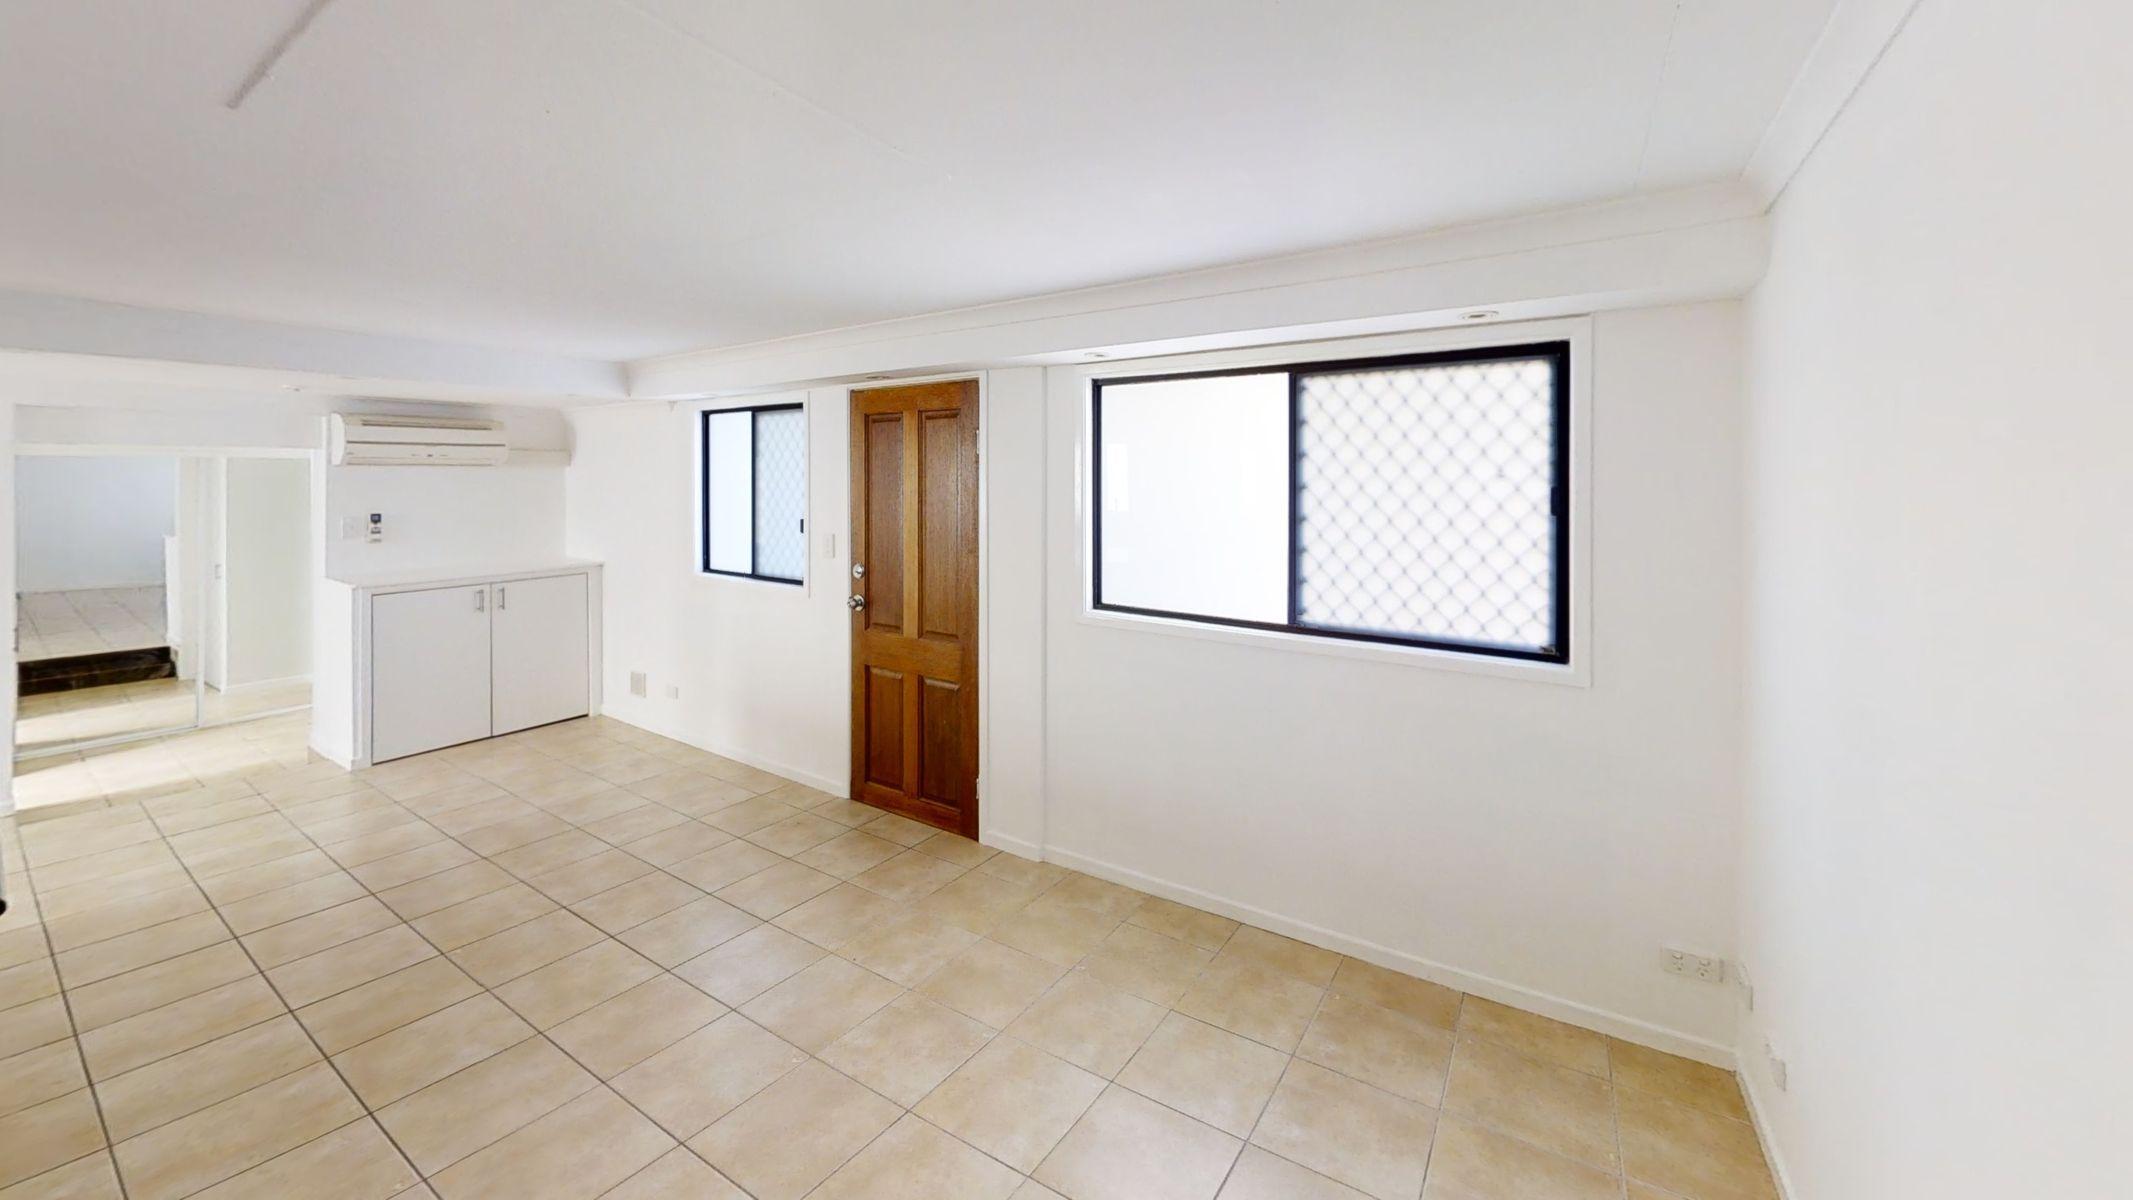 107 Grendon Street, North Mackay, QLD 4740